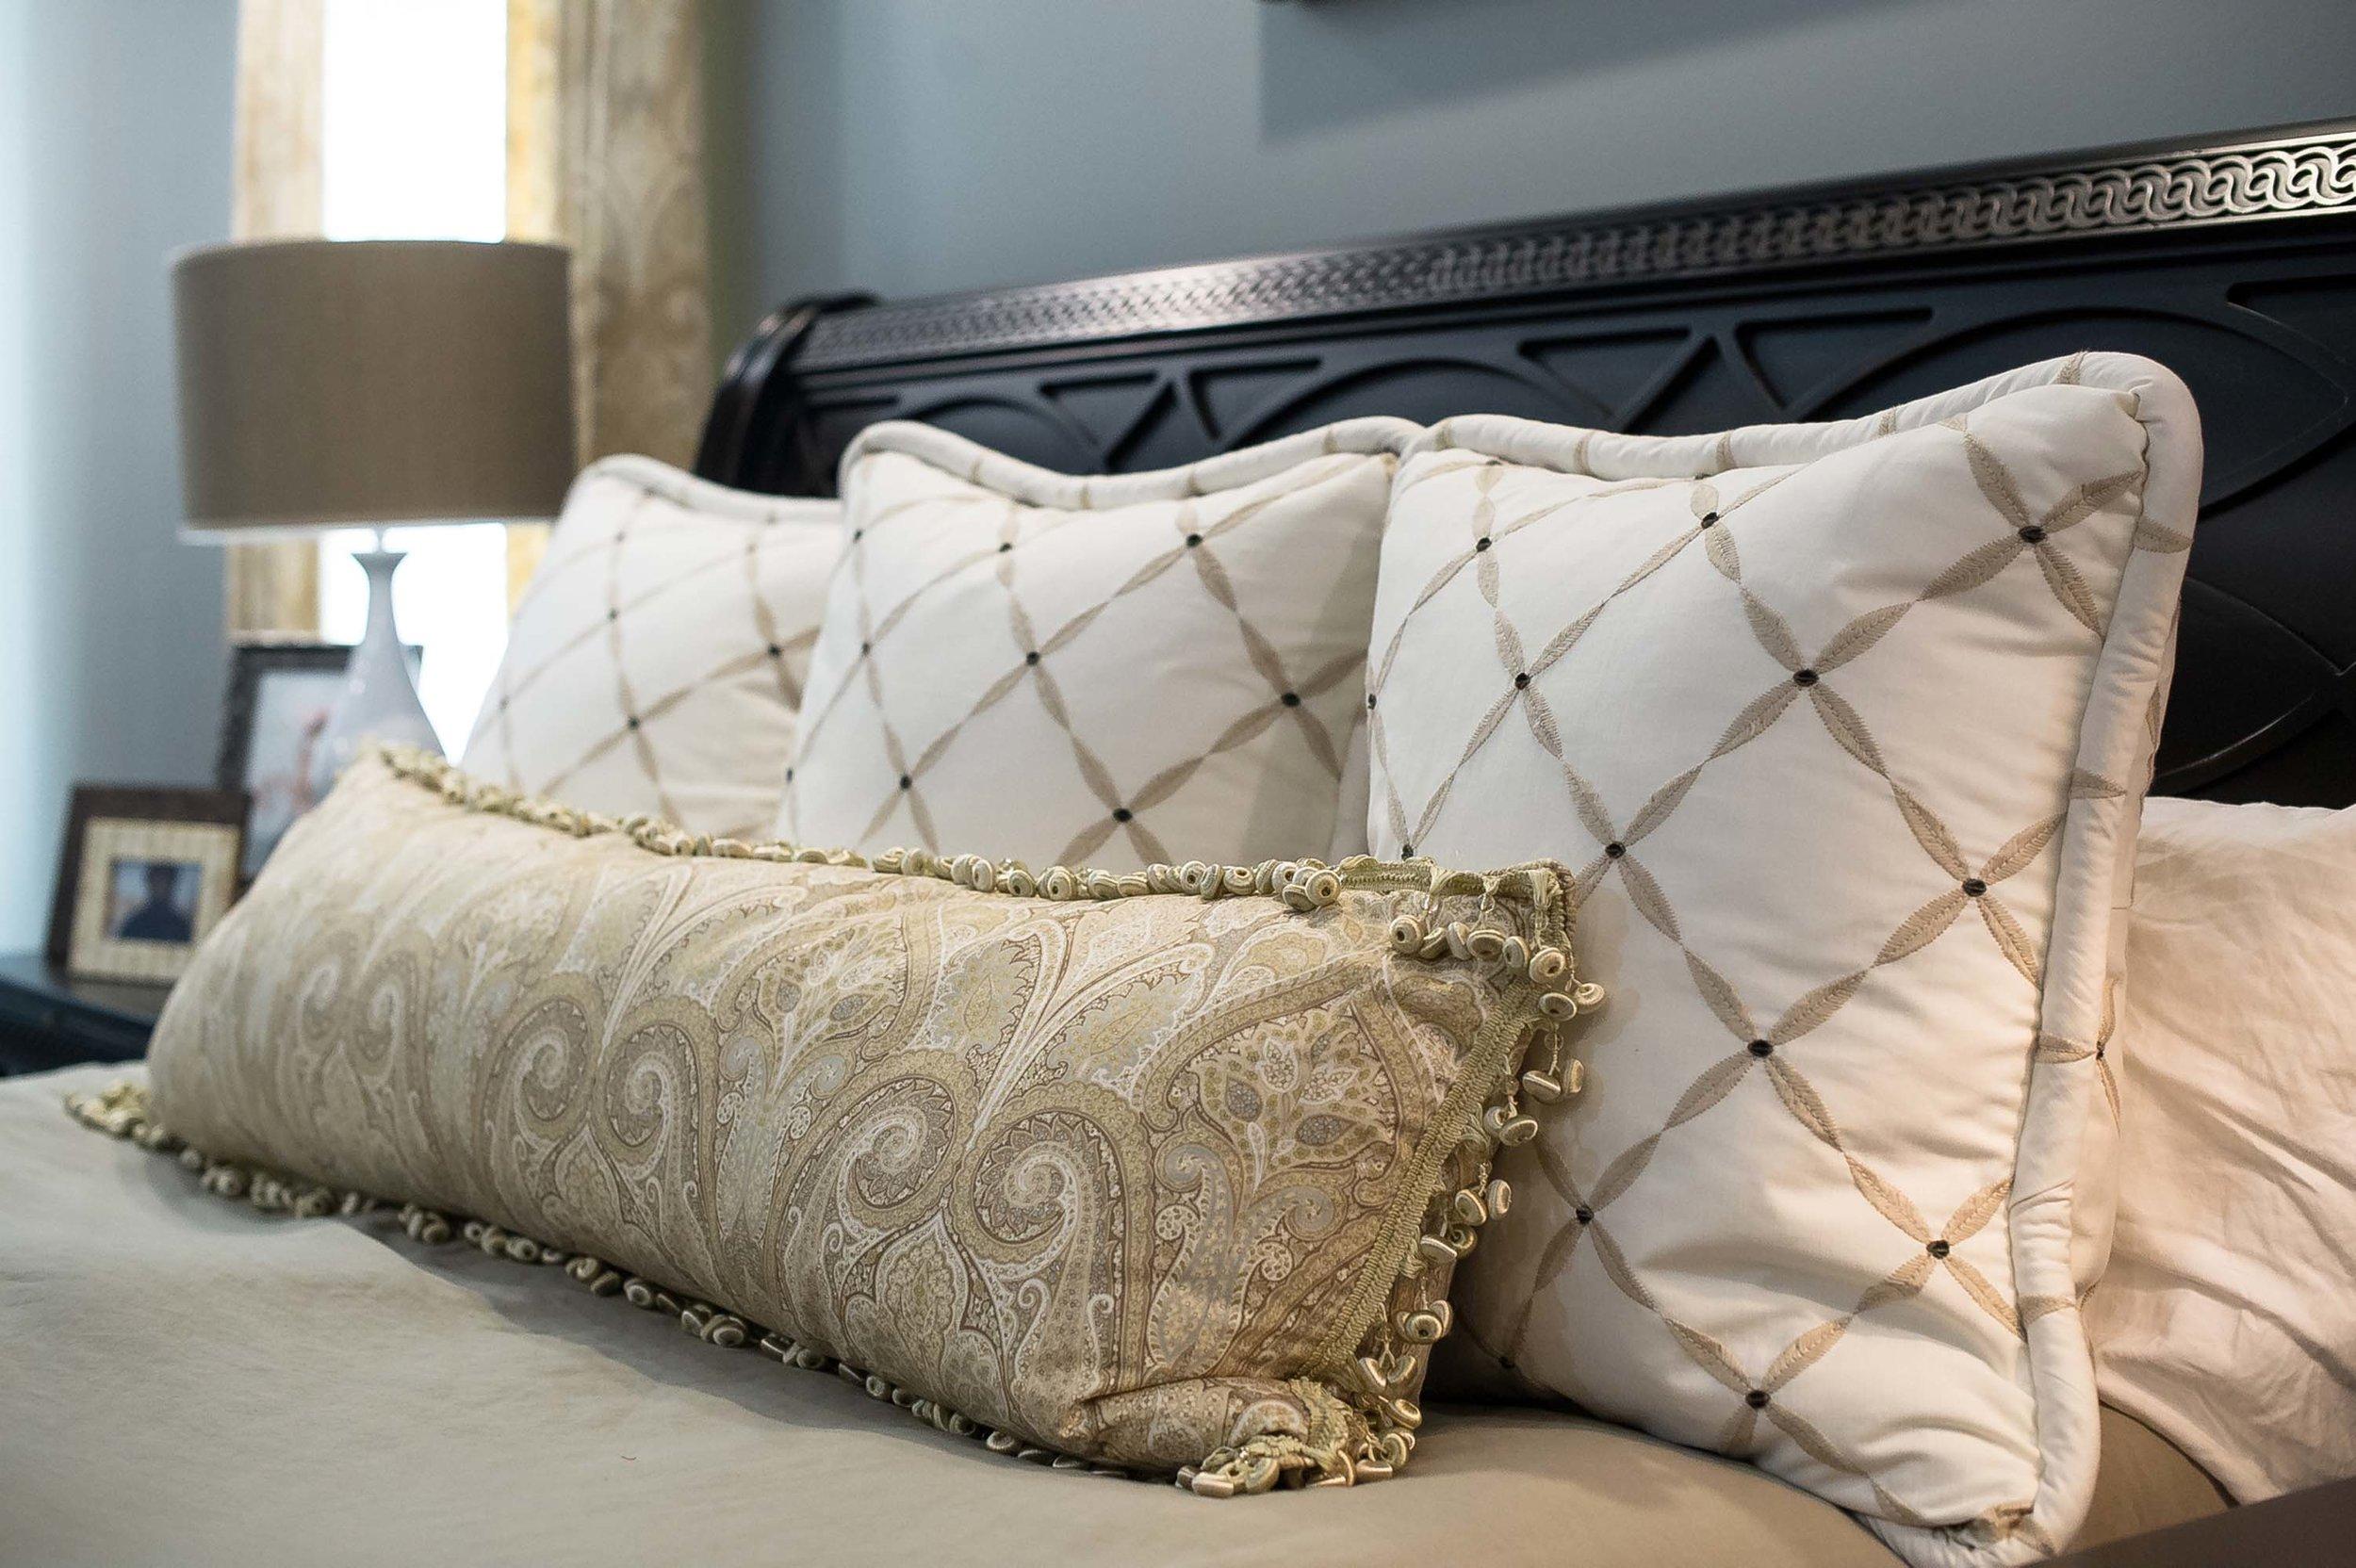 Custom Euros by Kravet and 19x60 Pillow with Fringe